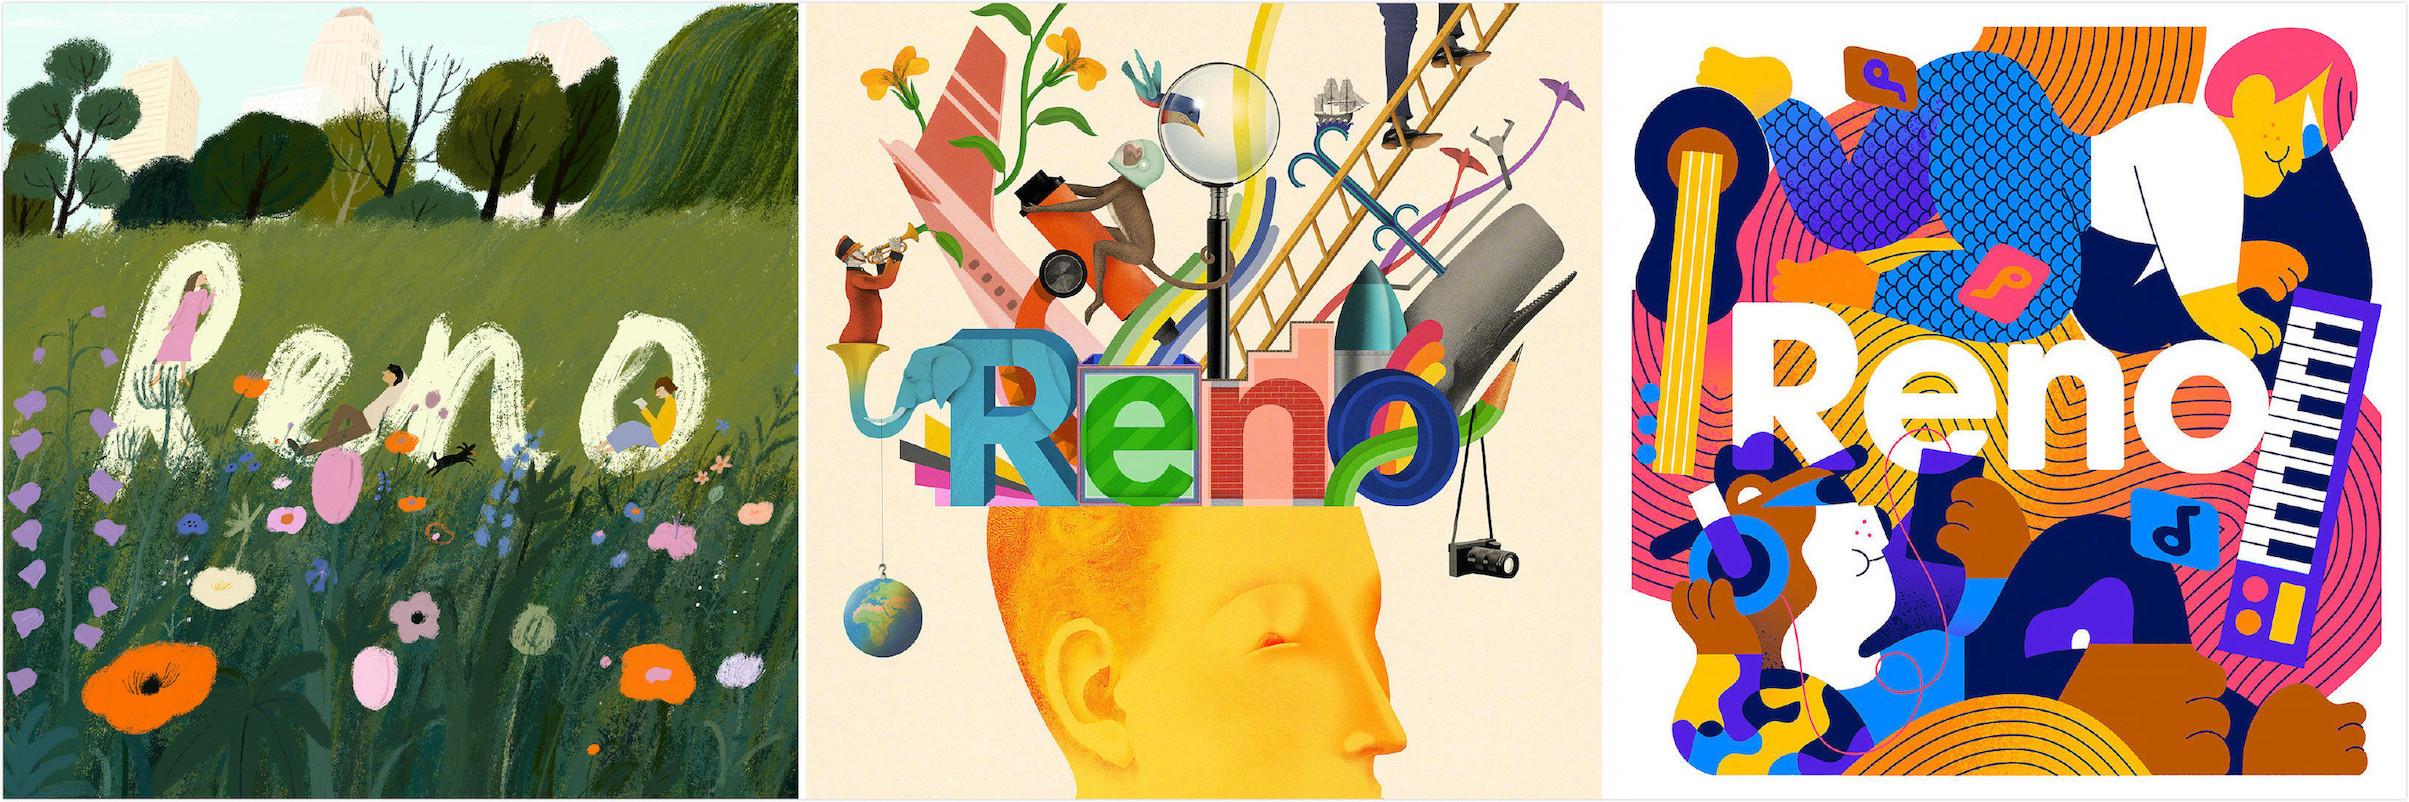 Reno-艺术家合作插画